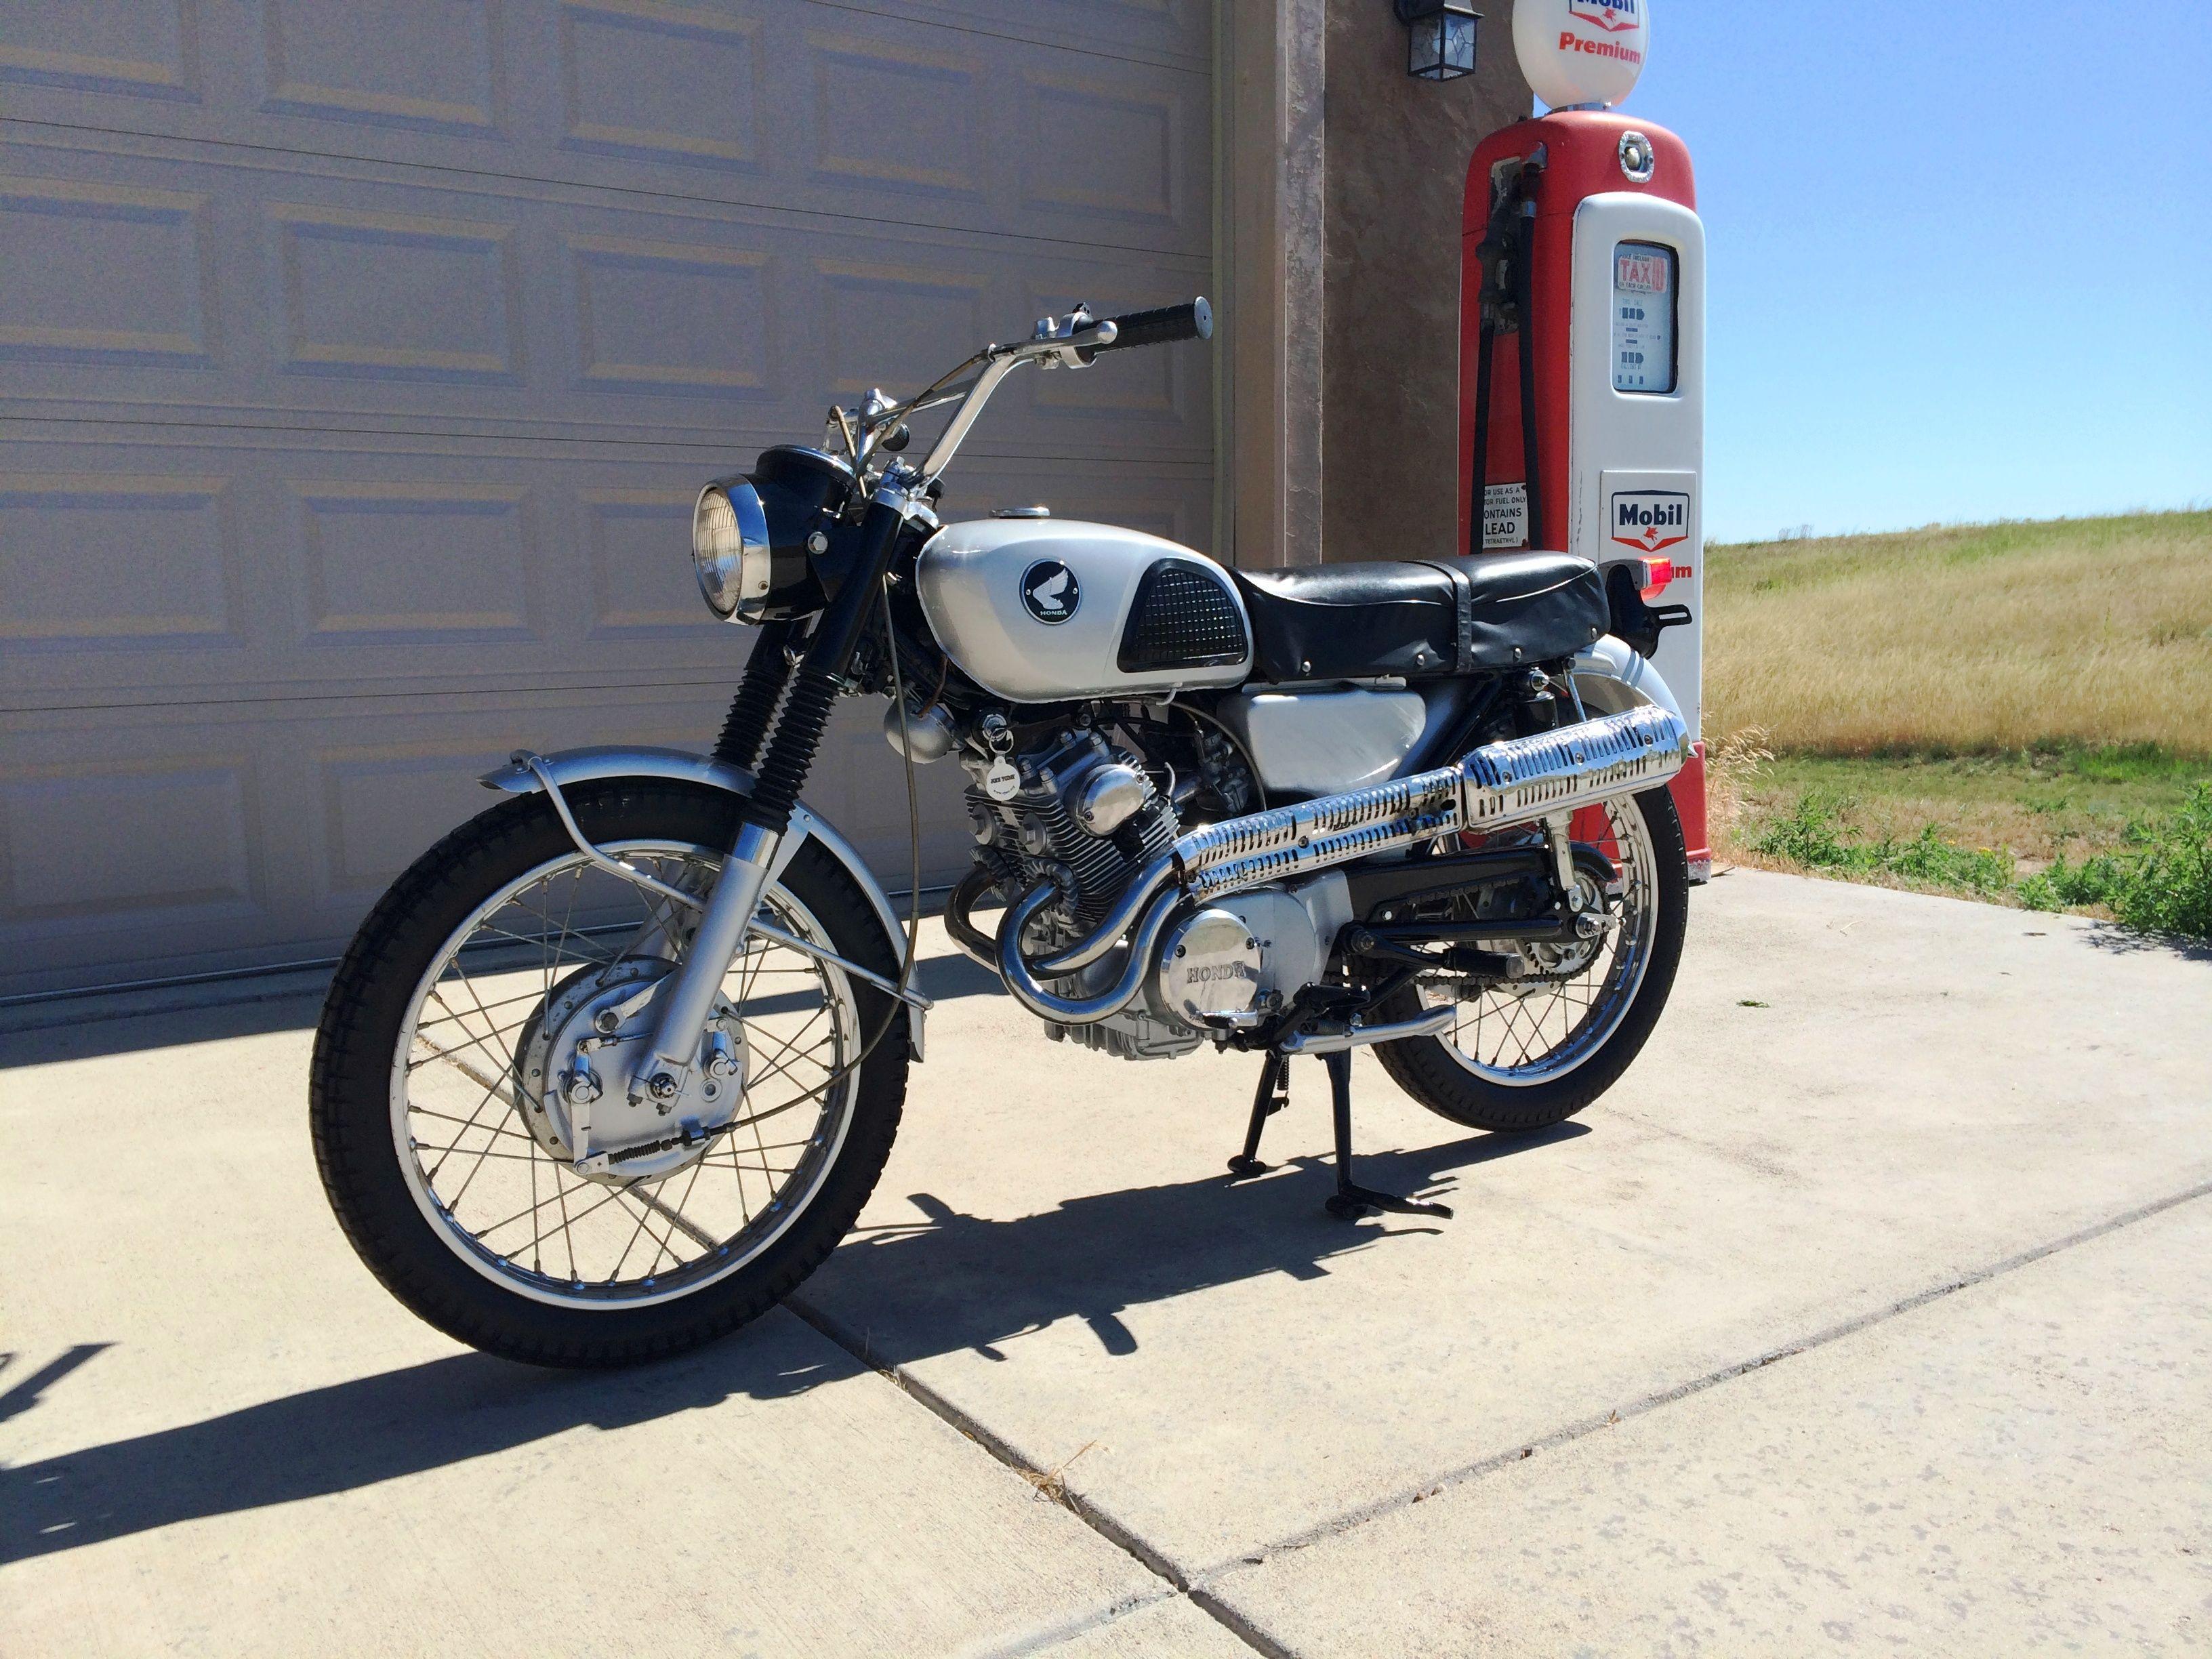 1966 Honda Cl160 Scrambler 160cc W 4spd Transmission Honda Motorcycles Vintage Honda Motorcycles Cafe Racer Honda [ 2448 x 3264 Pixel ]